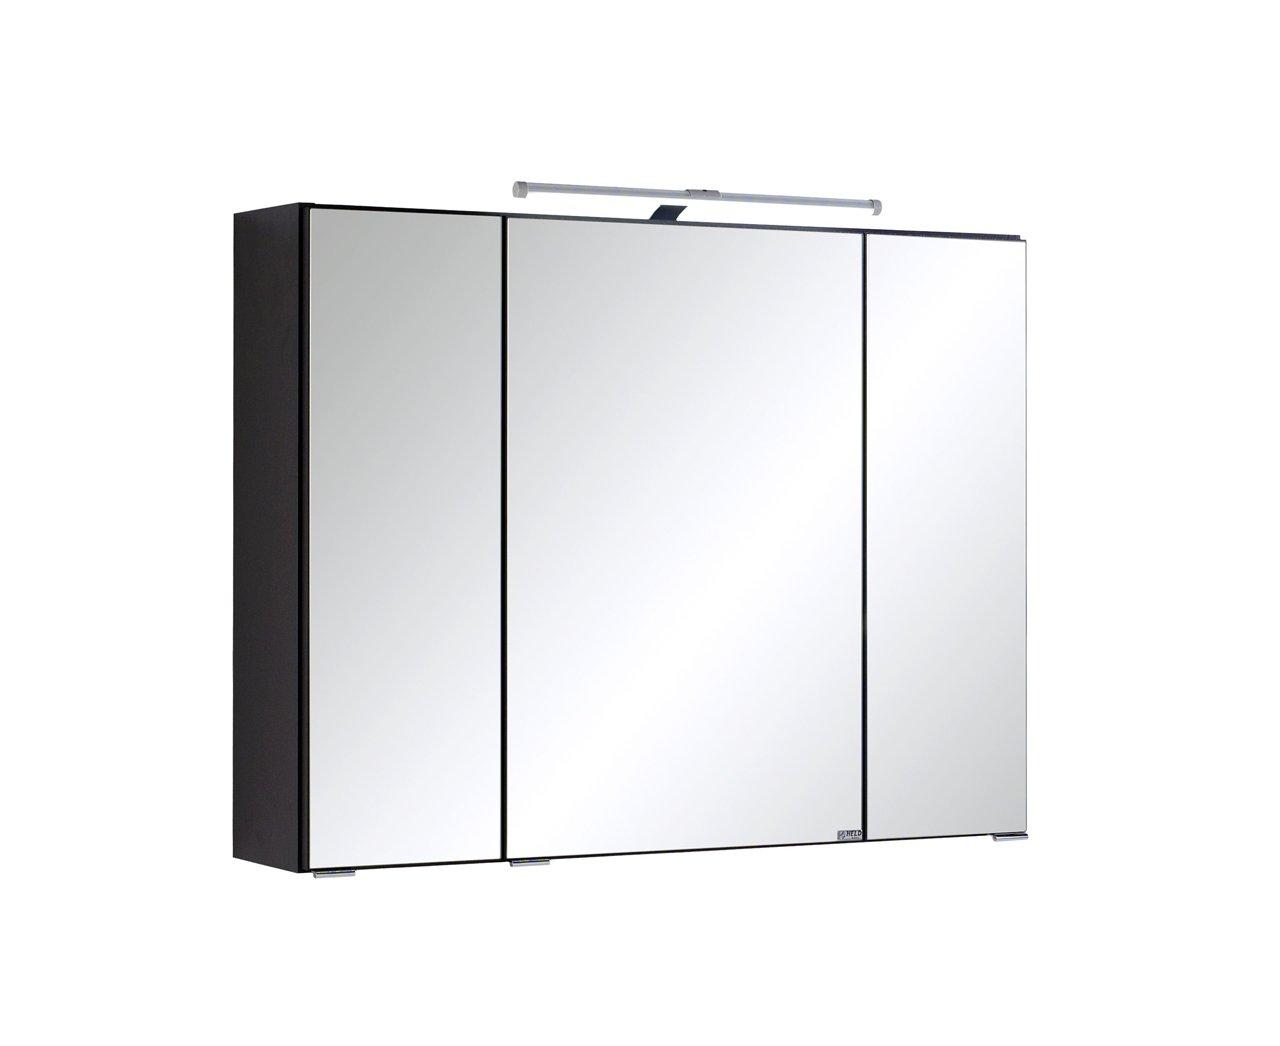 Lifestyle4living Spiegelschrank, Badezimmerschrank, Badschrank, Badspiegel, Hängeschrank, Badezimmerspiegel, 3-türig, inkl. LED-Beleuchtung, Graphit, grau